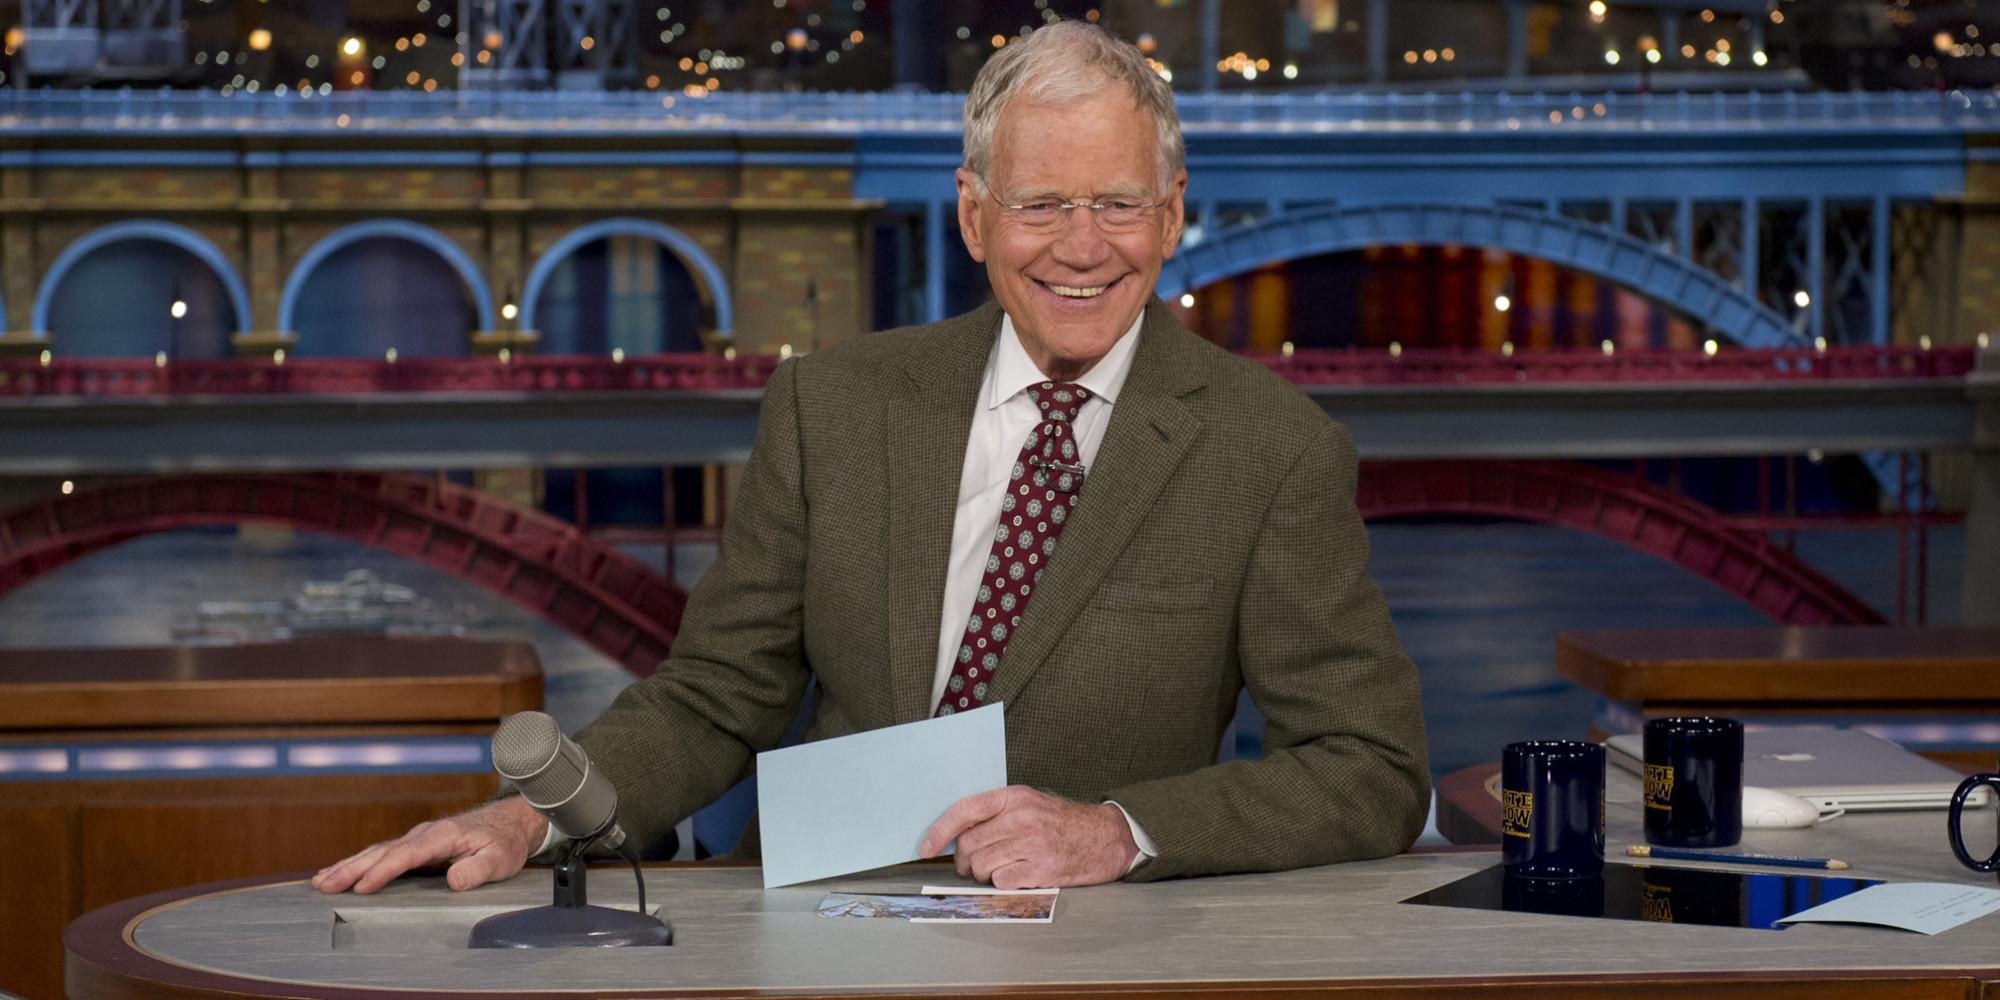 Biggest Celebrity Marriage Downfalls Of 2014 |Did David Letterman Get Divorced